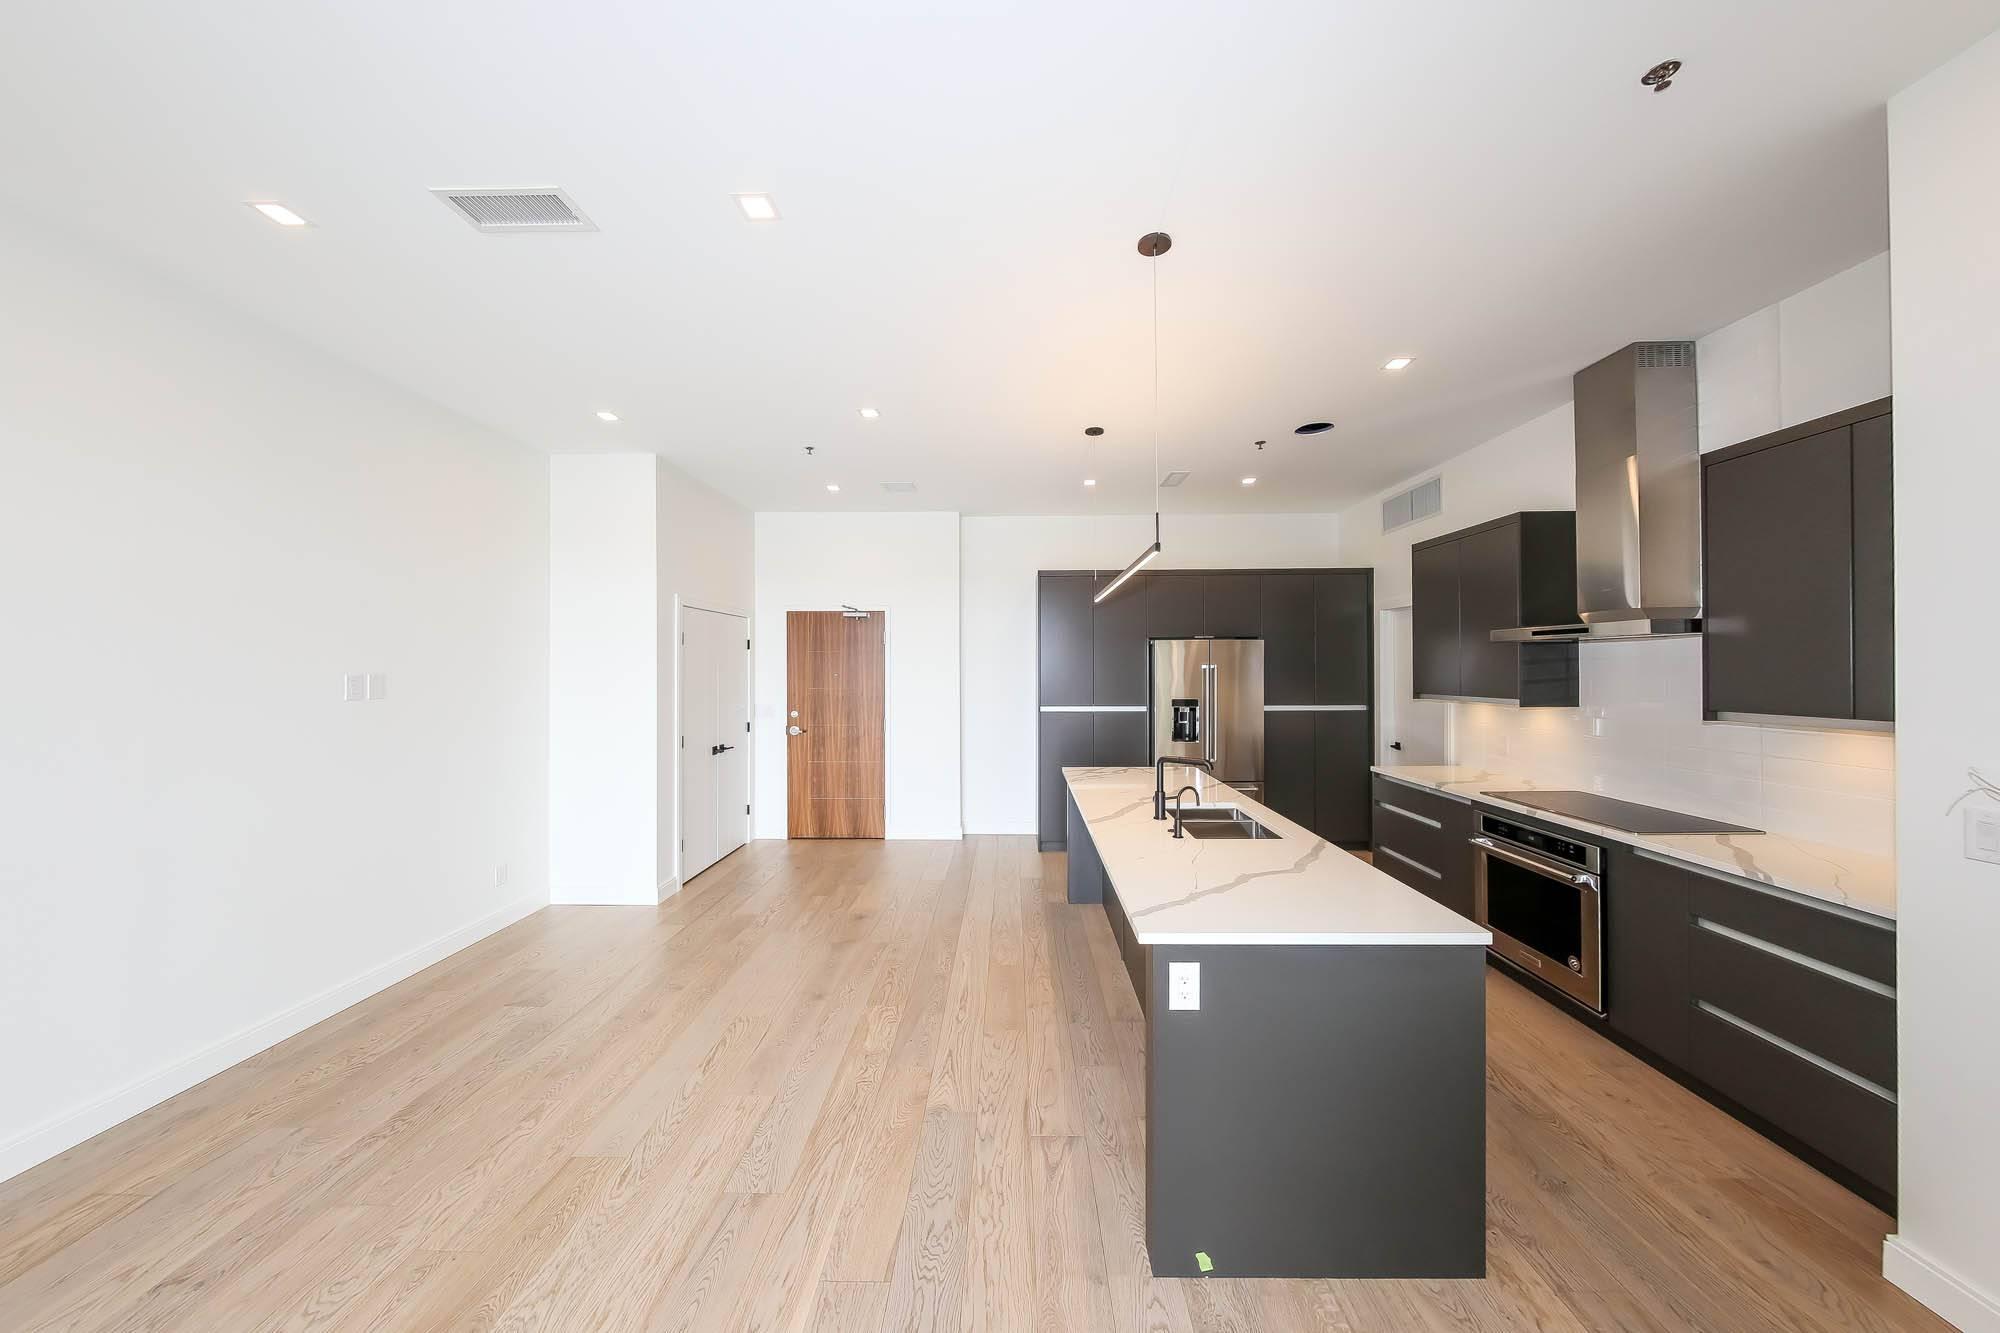 139 Tuxedo Ave,Winnipeg,Manitoba,2 Bedrooms Bedrooms,2 BathroomsBathrooms,Condo,Tuxedo Ave,1235